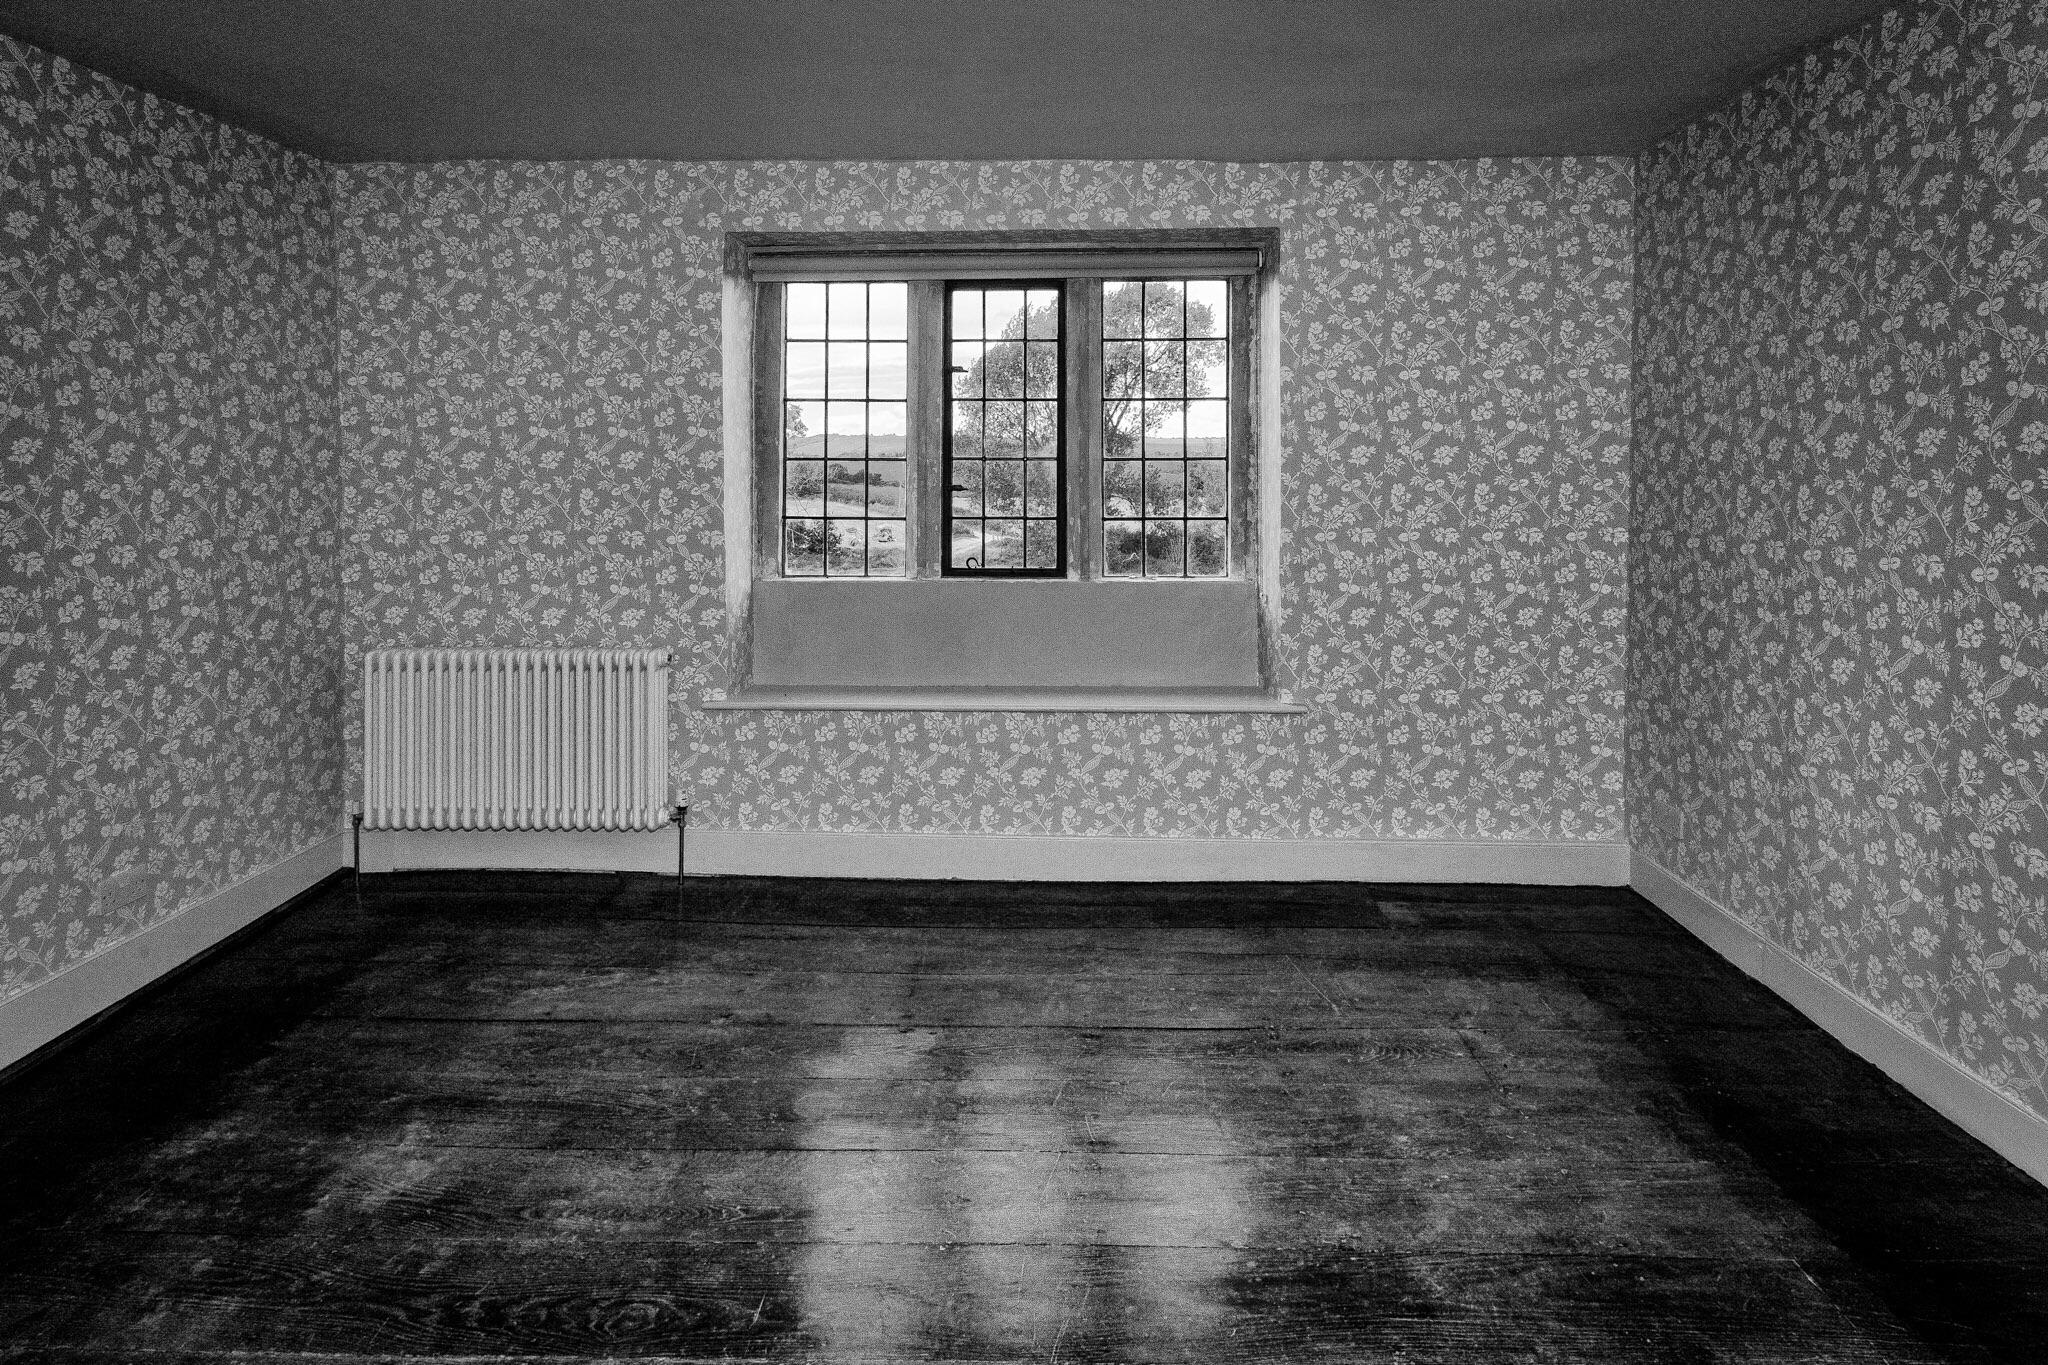 Room in a farm by Rick McEvoy Dorset Photographer